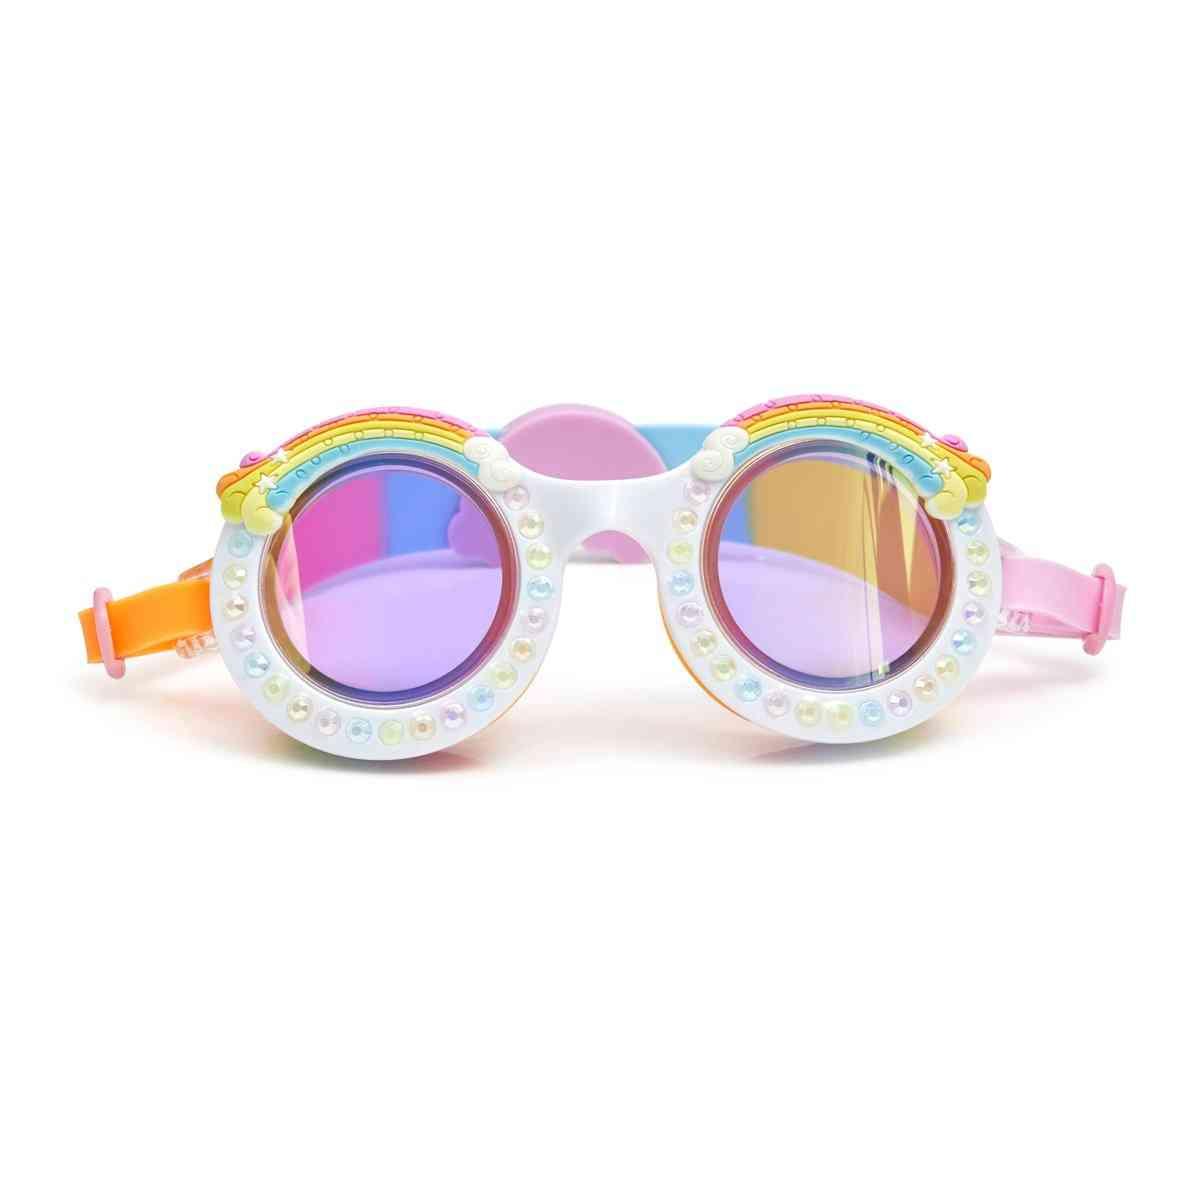 Rainbow Swim Goggles